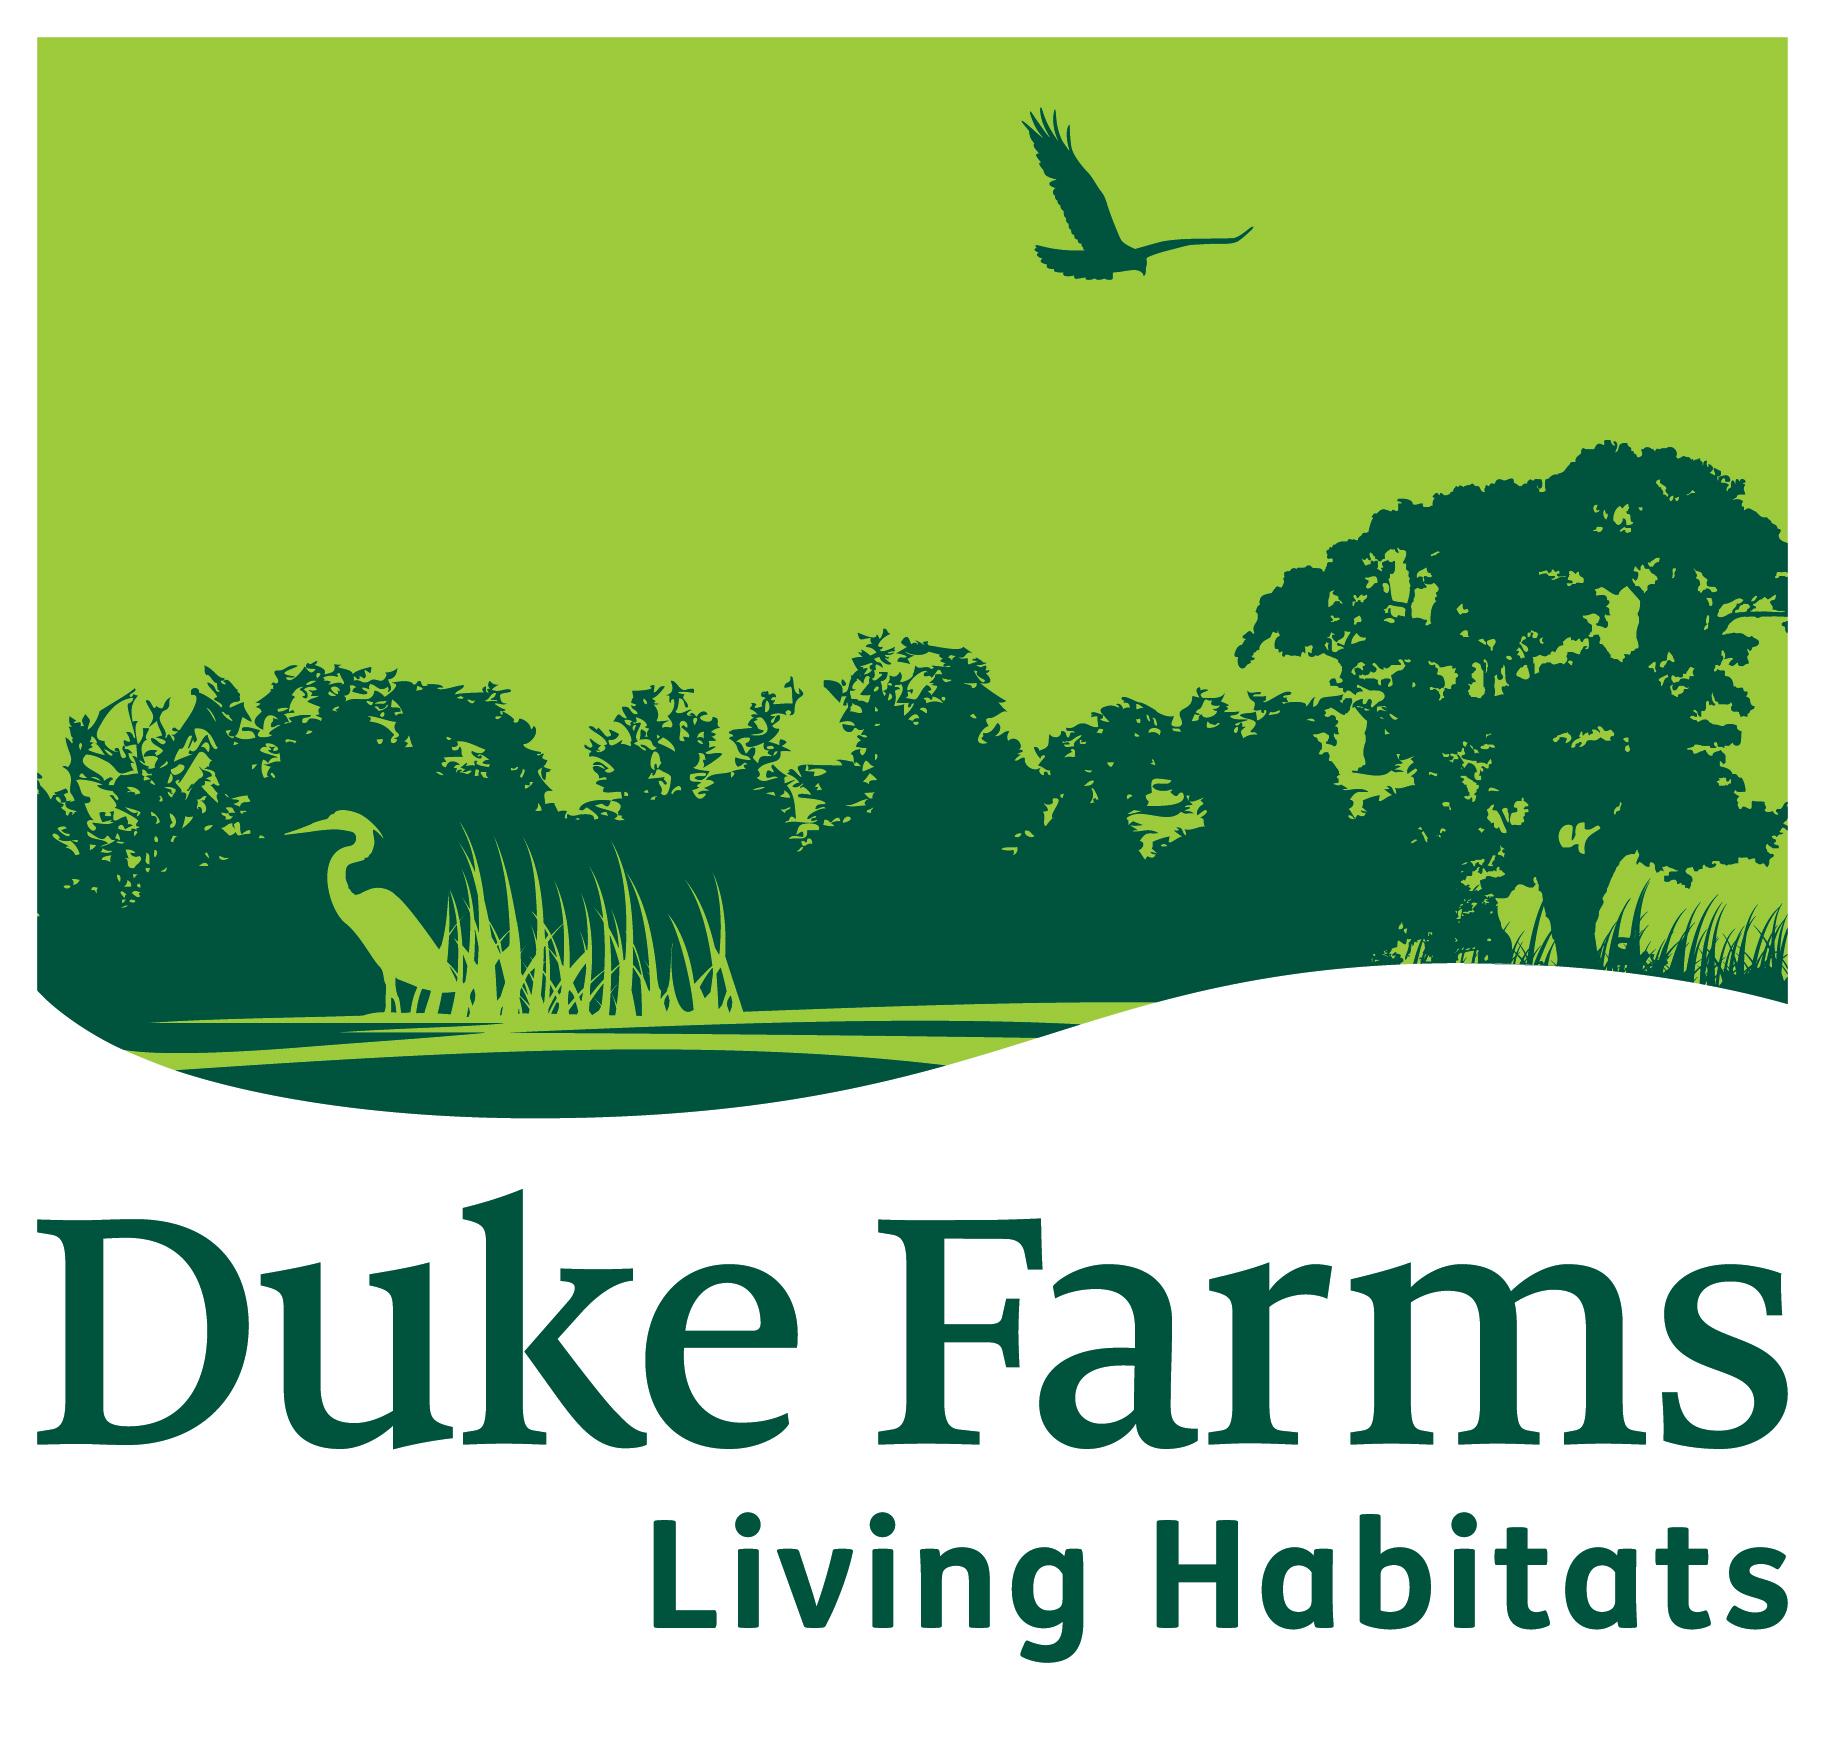 Duke Farms Coupons Near Me In Hillsborough 8coupons